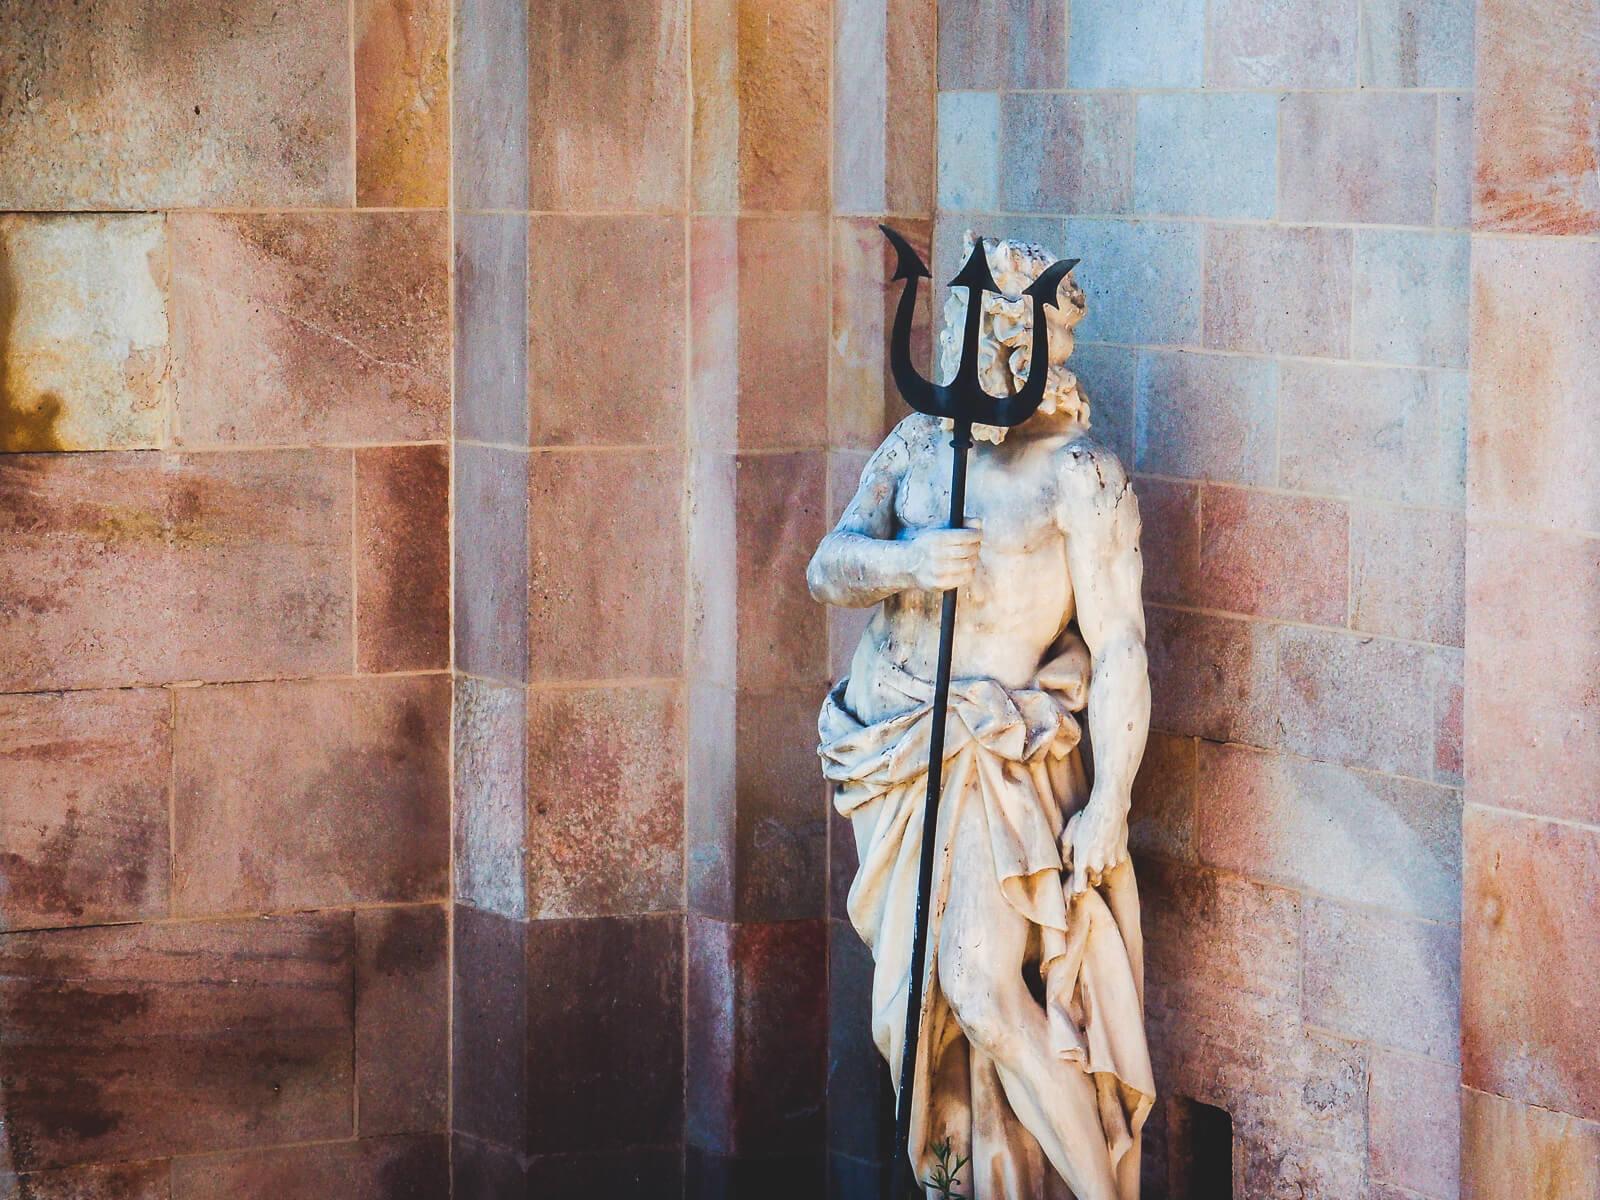 Barcelona Street Photography, Poseidon holding trident, cascada monumental fountain, stone figure